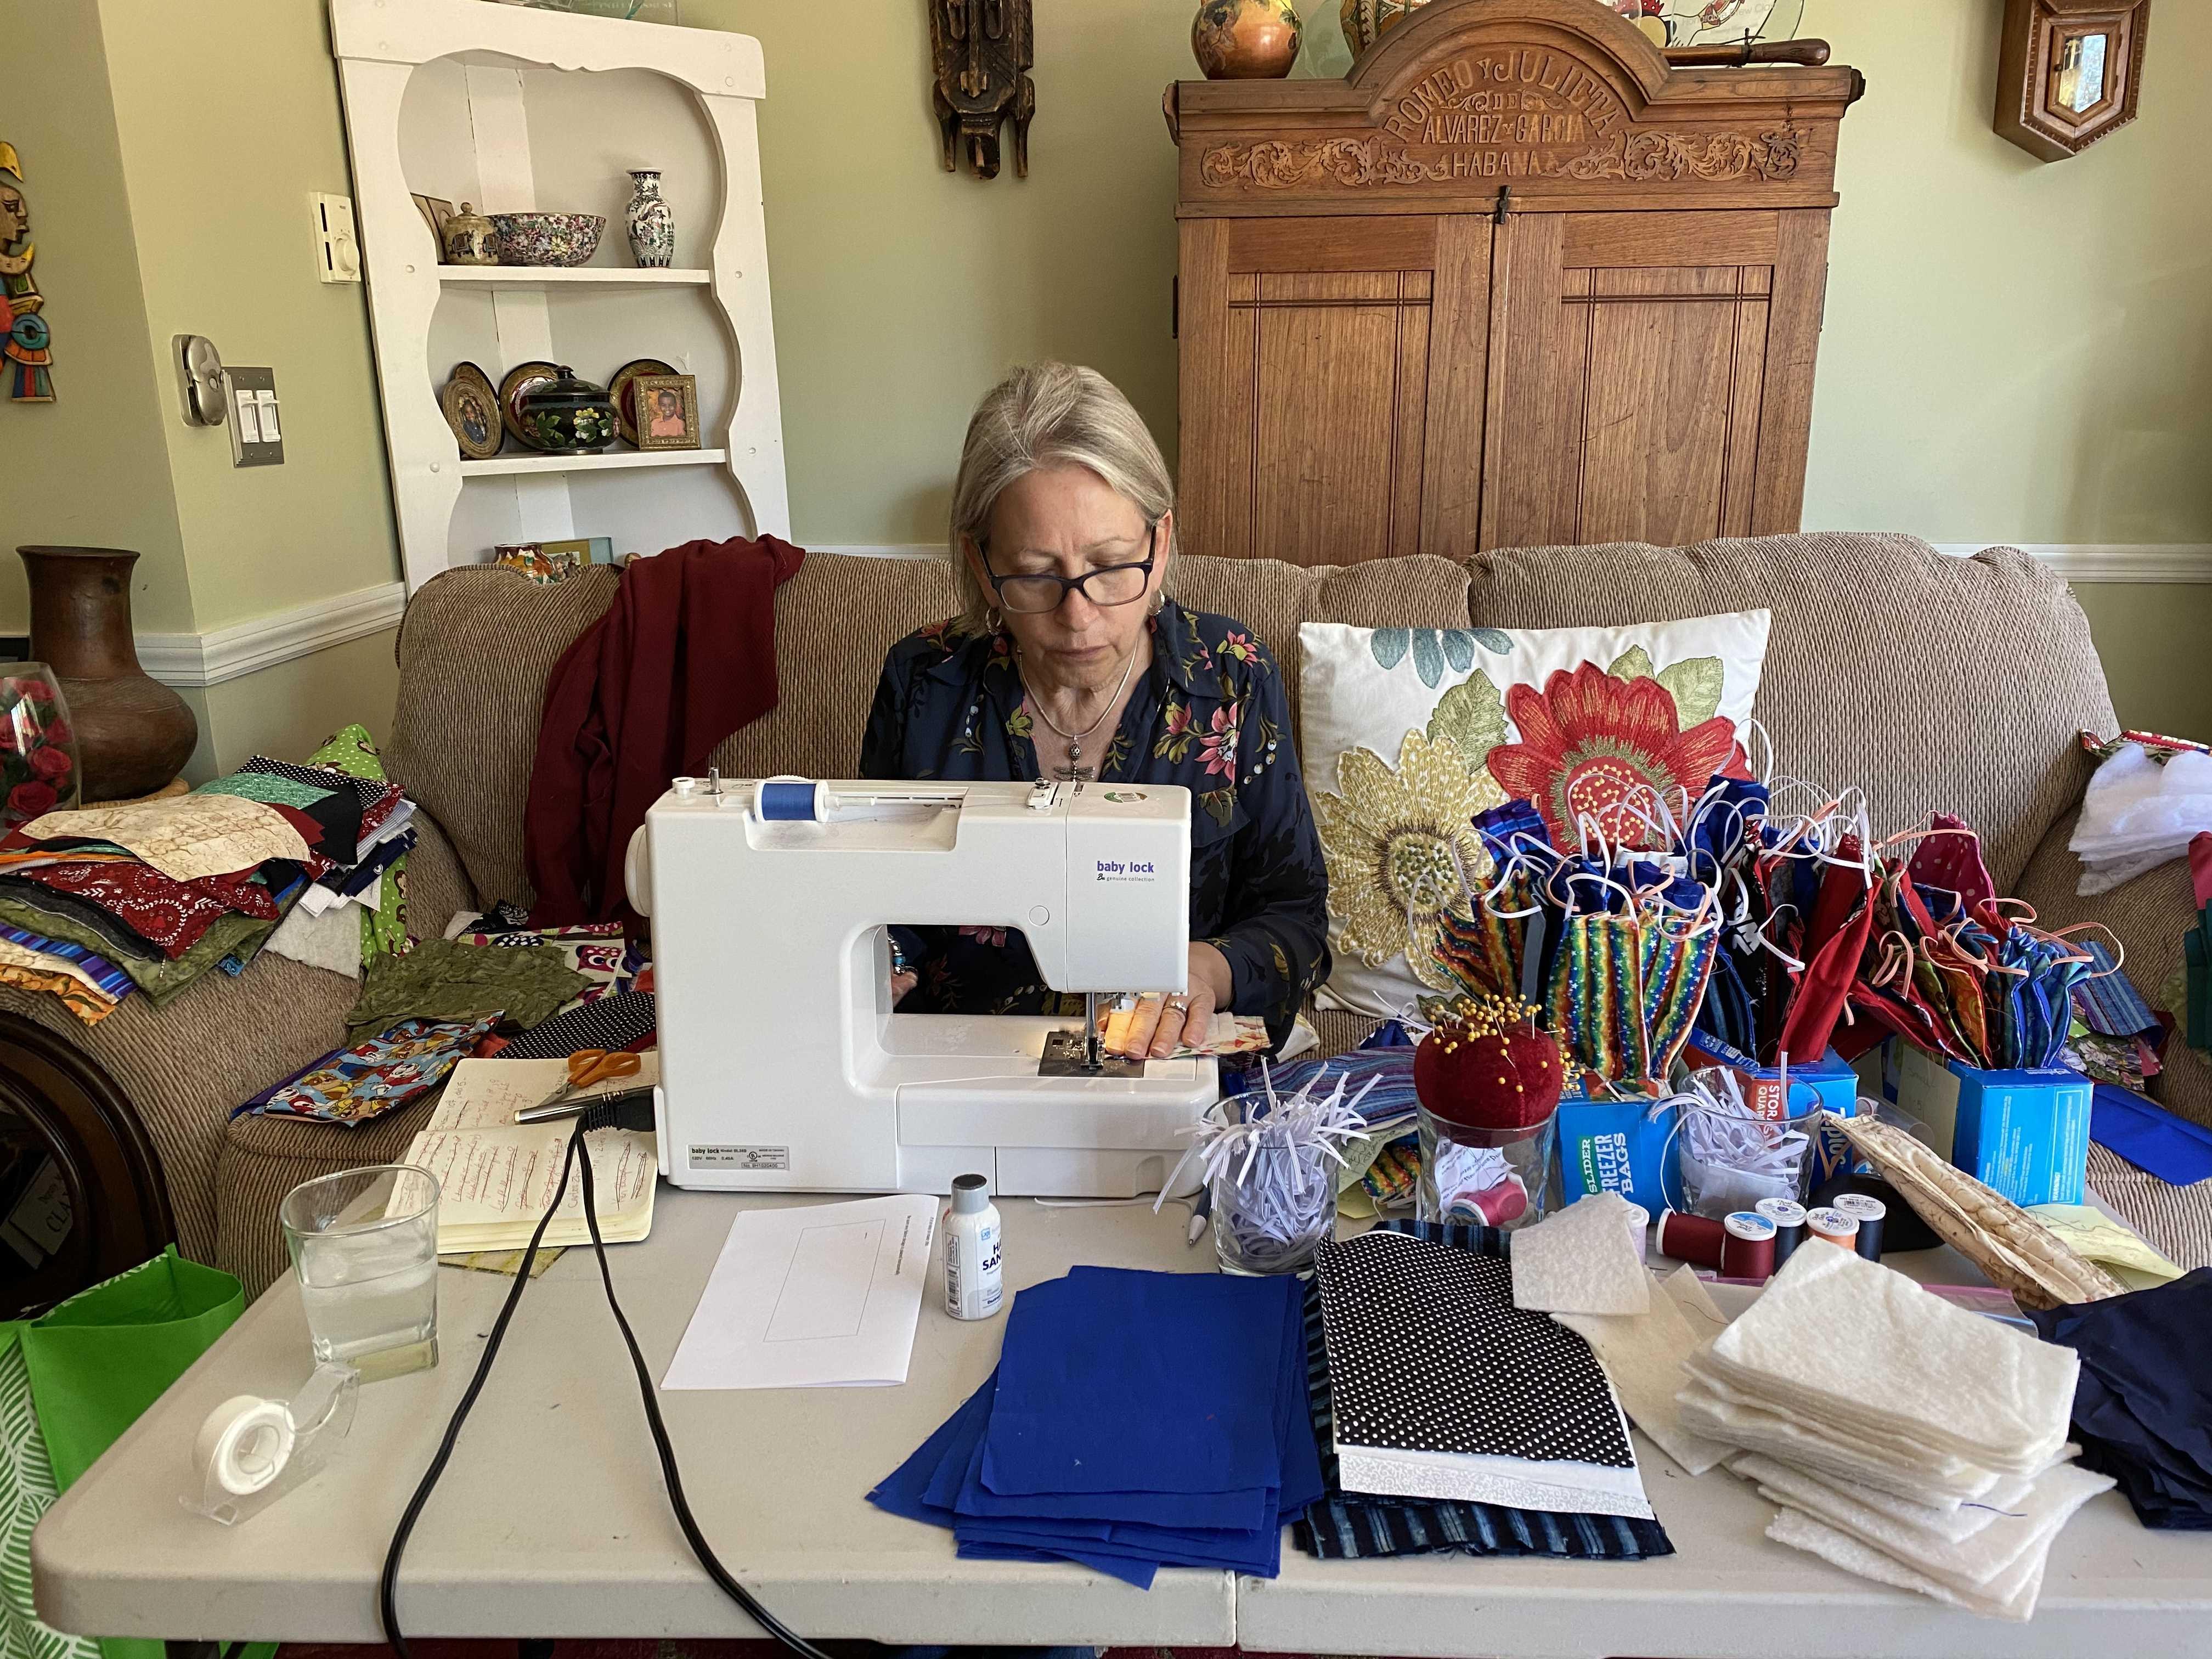 Drew at sewing machine